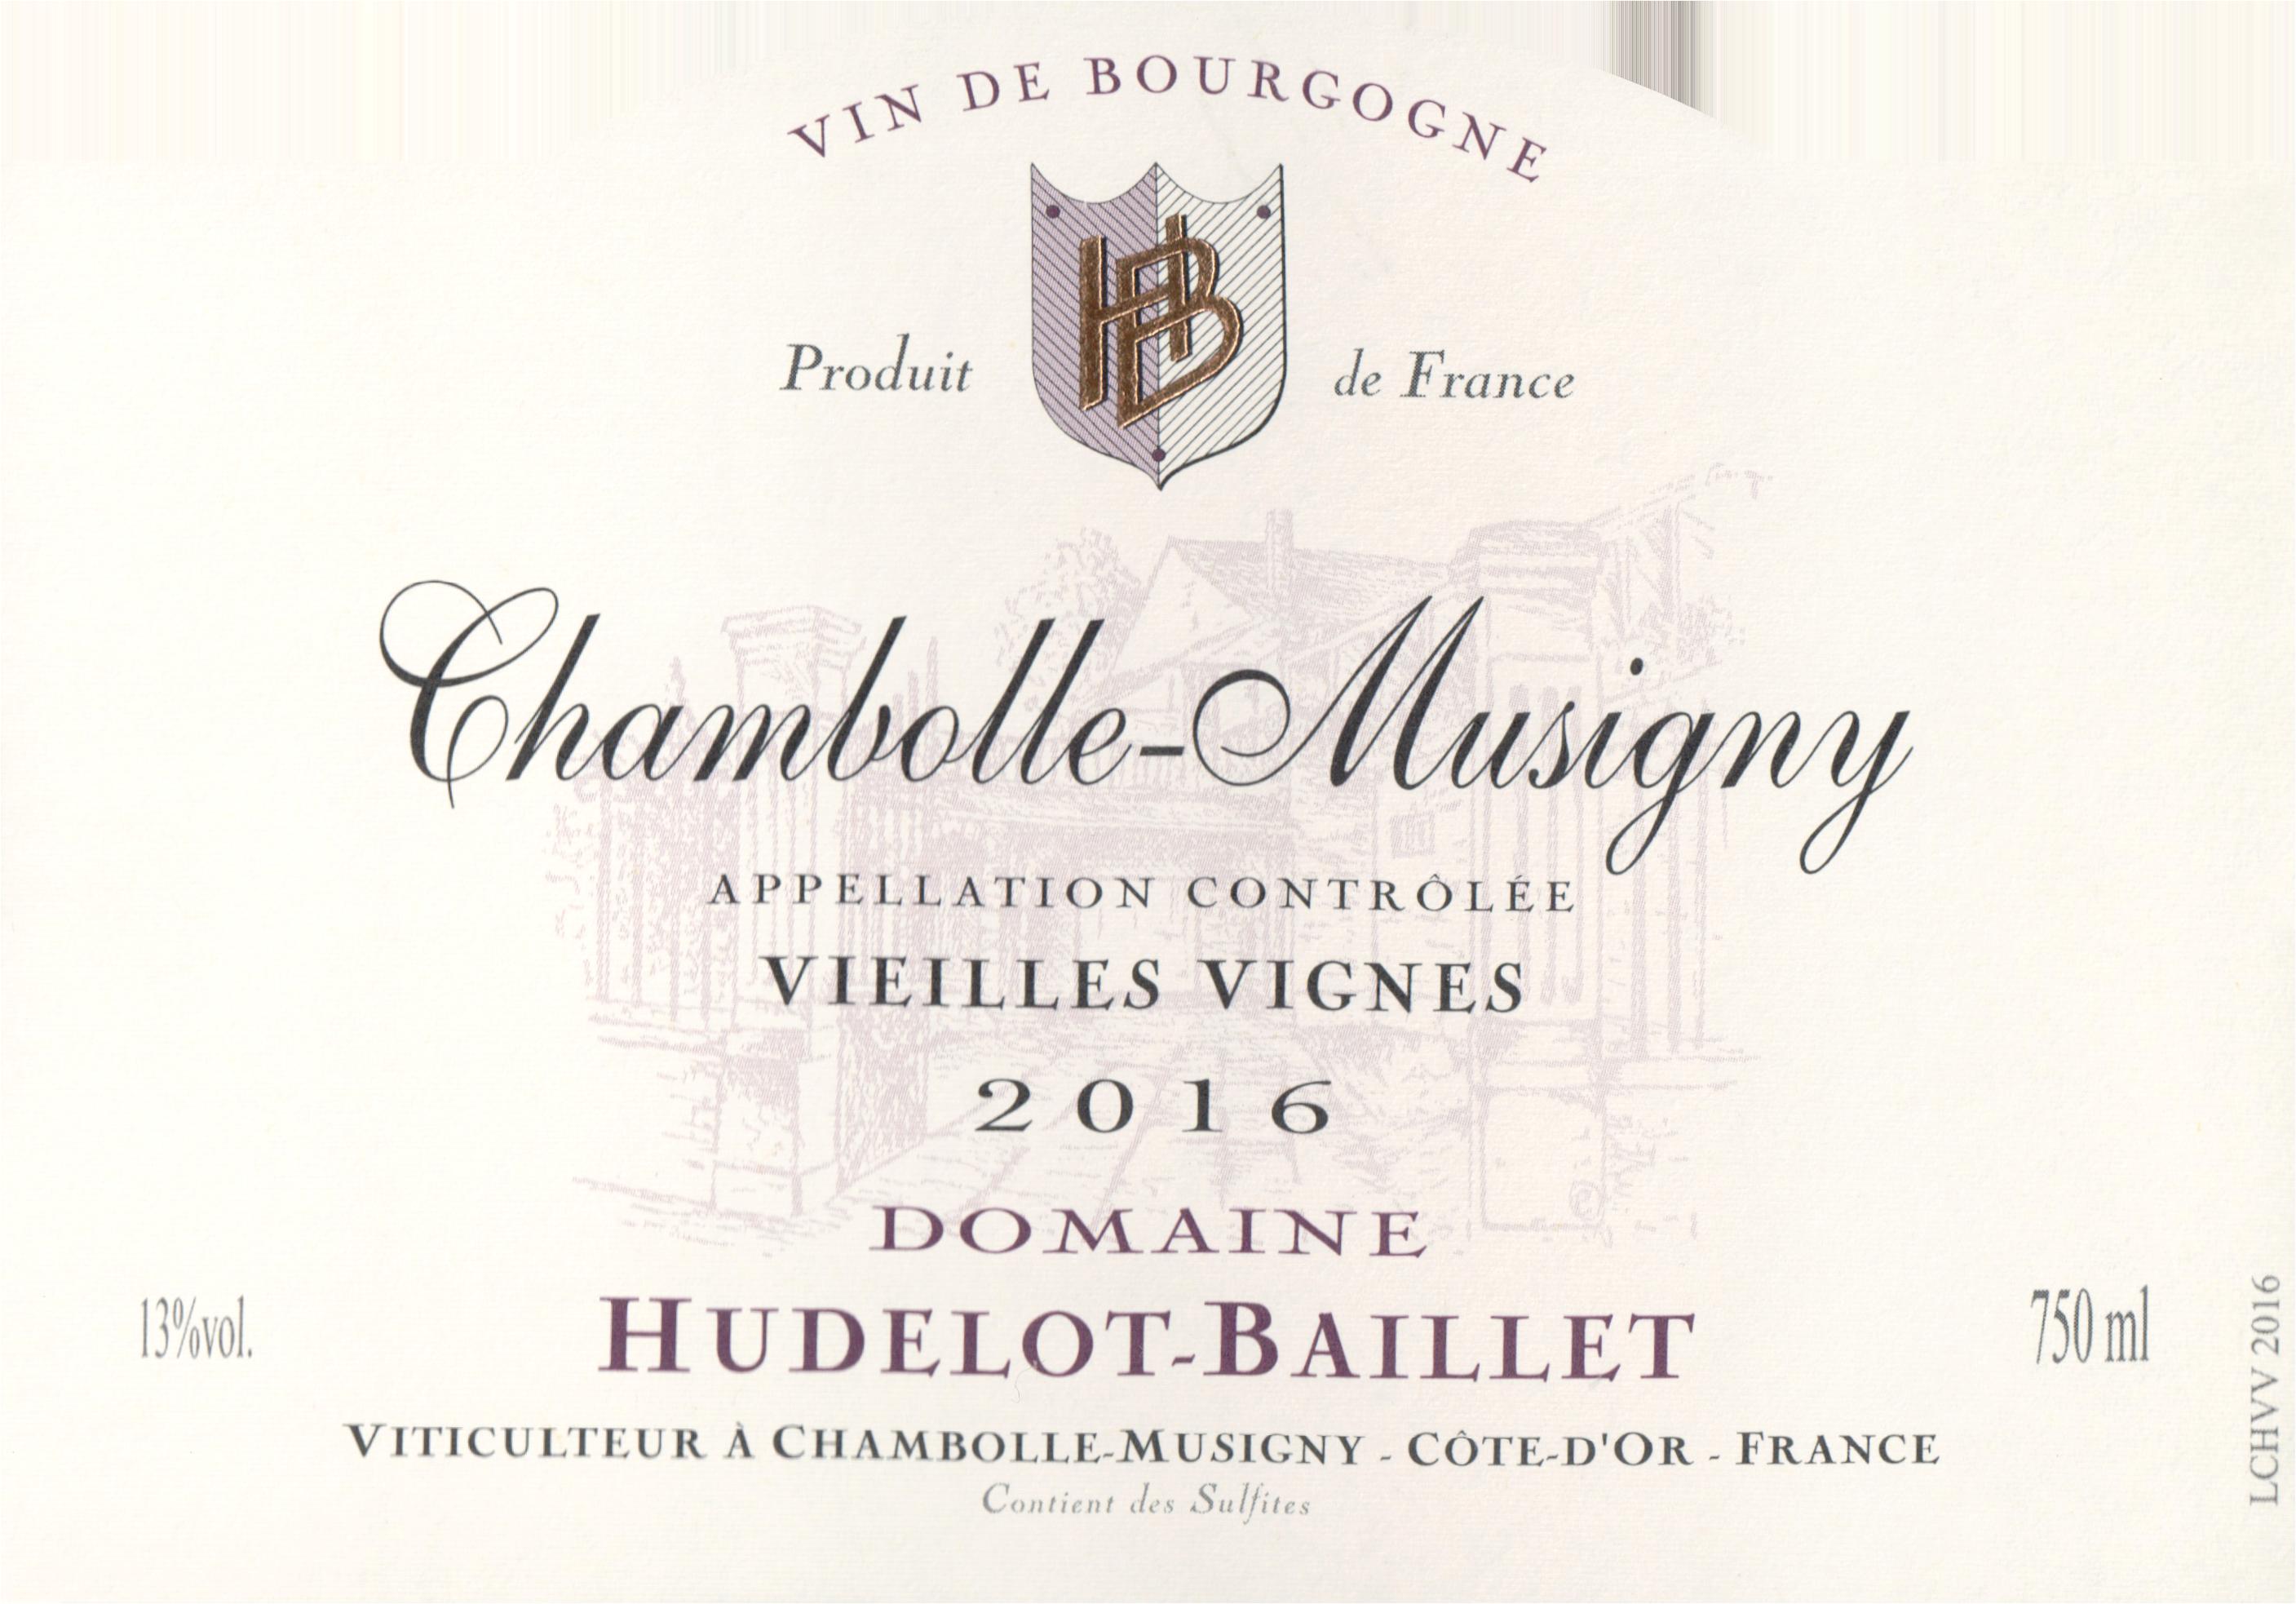 Domaine Hudelot Baillet Chambolle Musigny Vieilles Vignes 2016